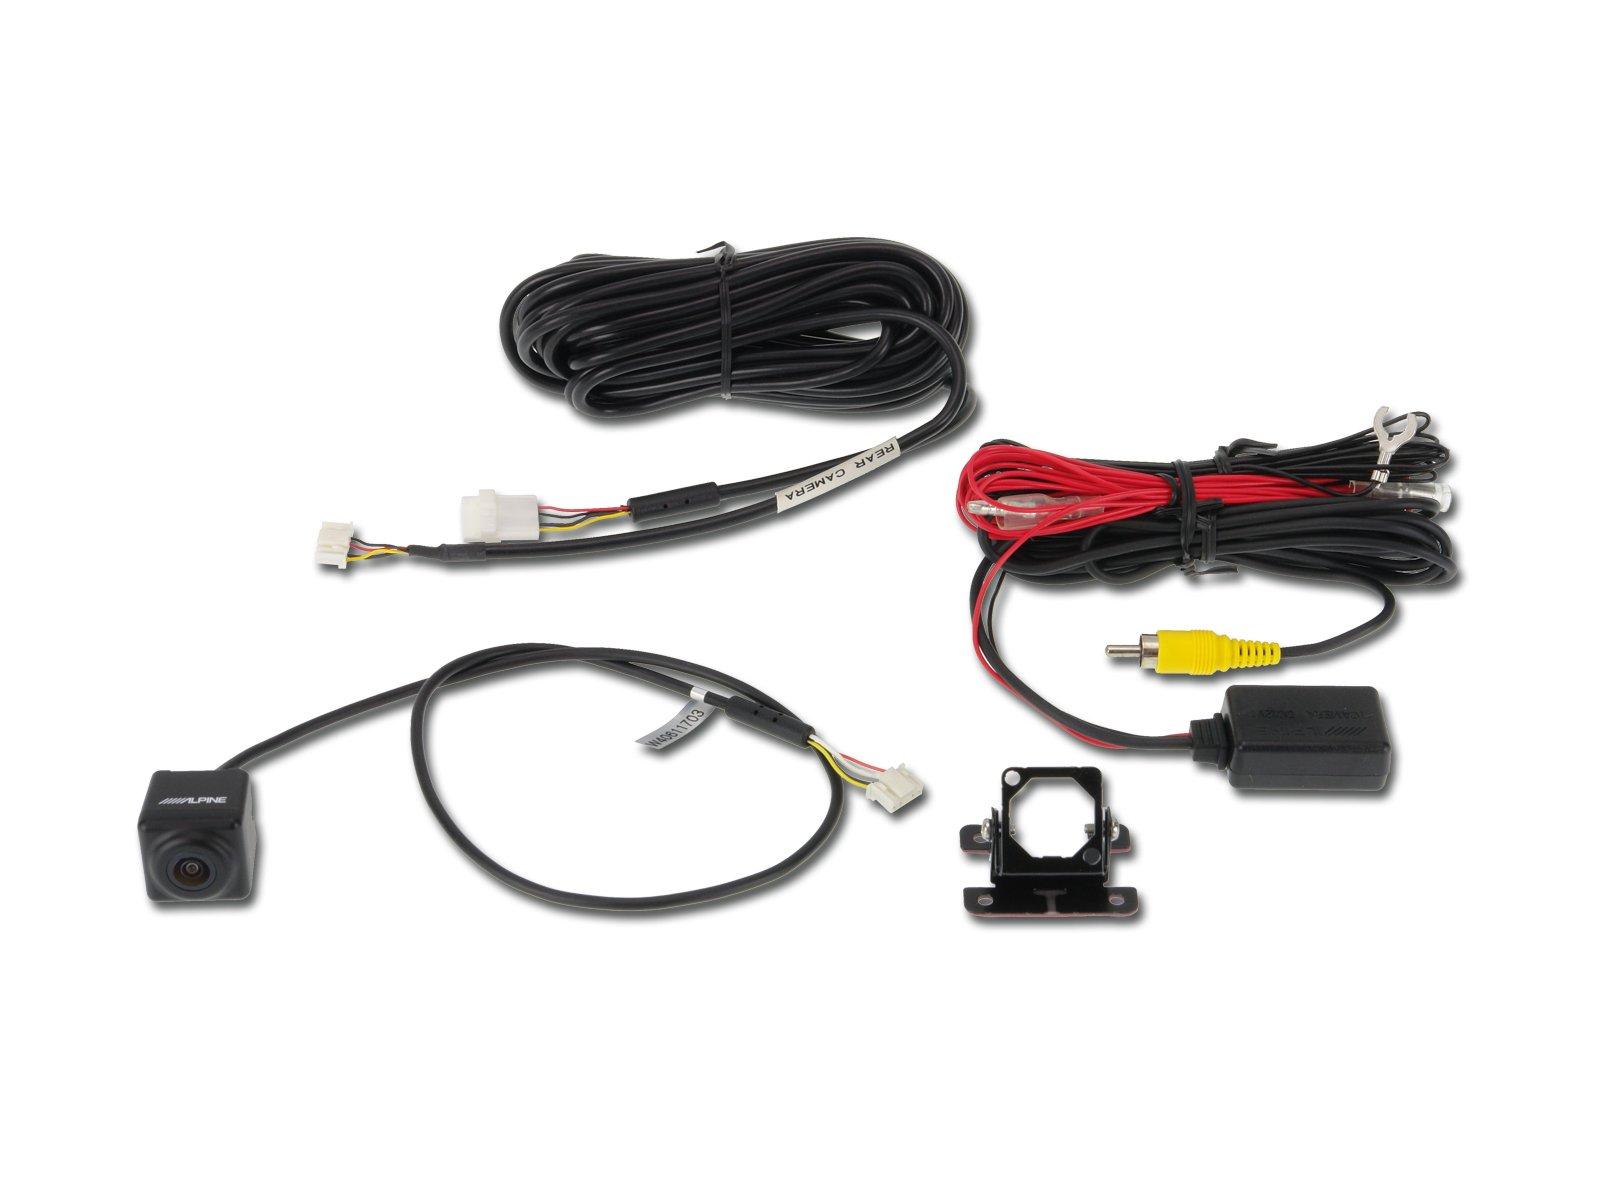 Alpine HCE-C125 Rear View Camera